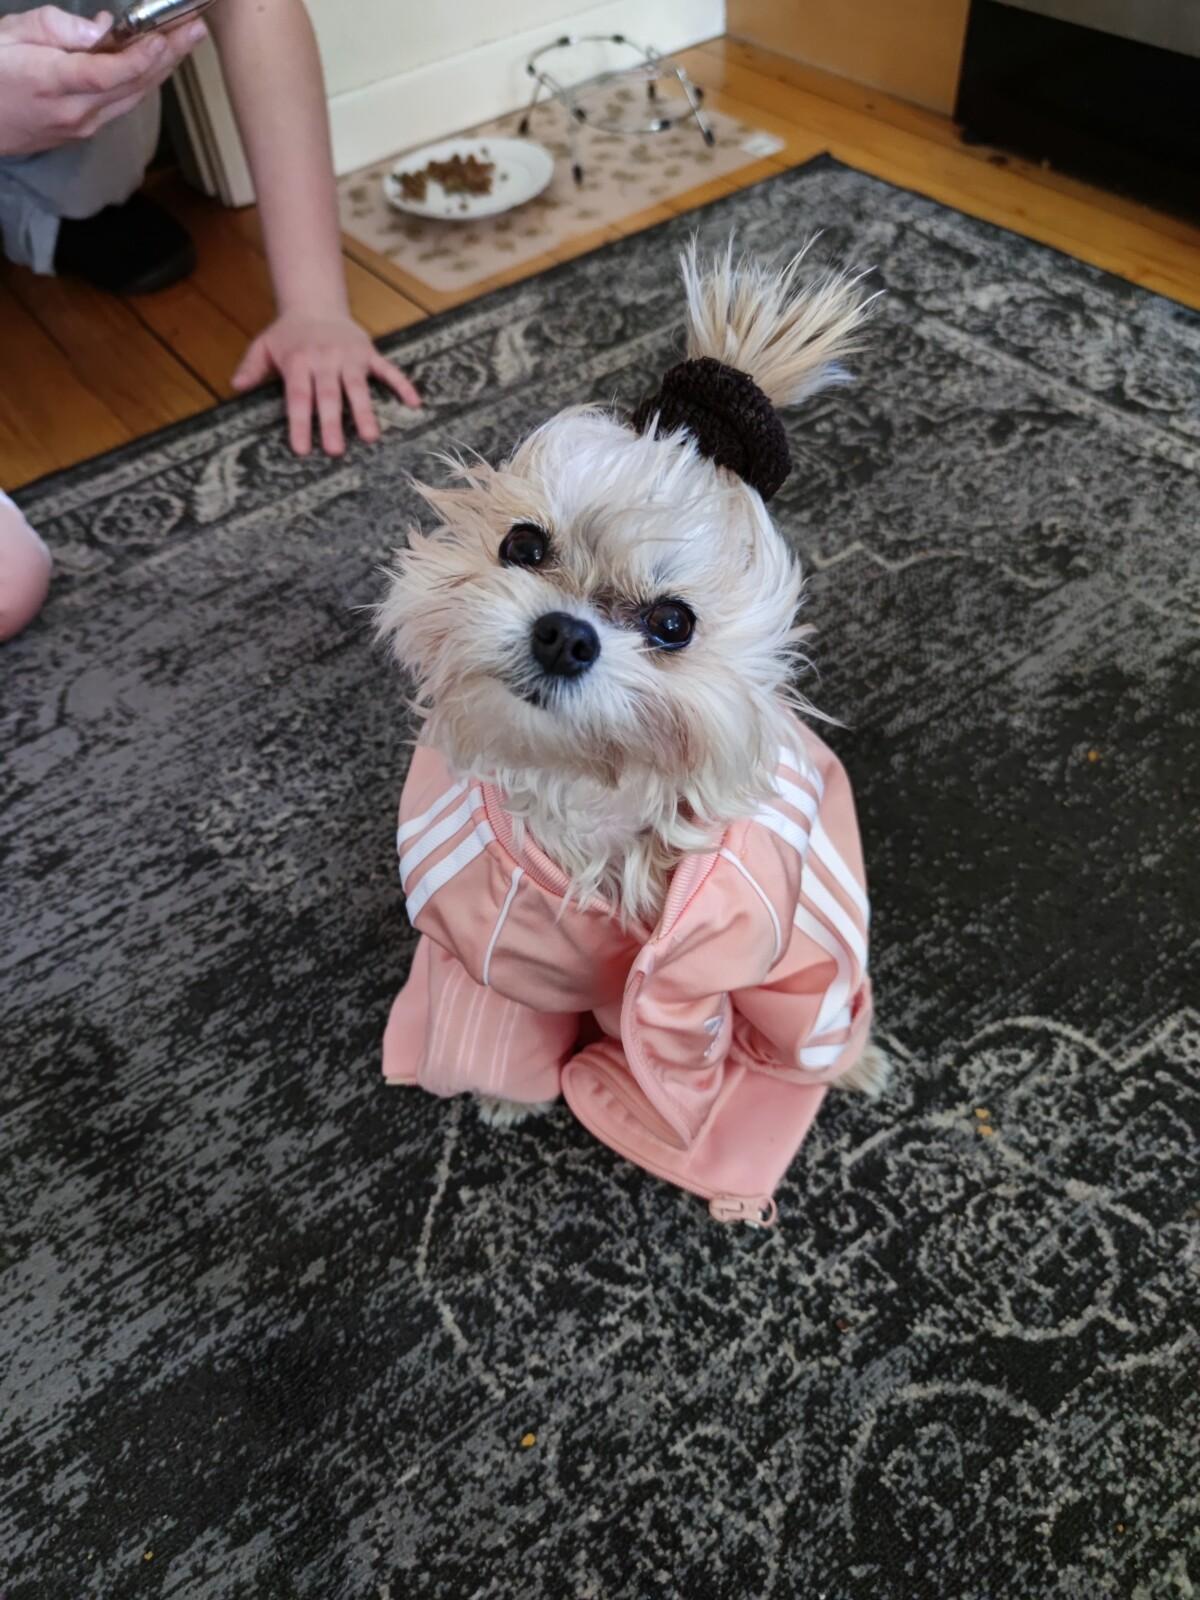 pomeranian-chihuahua-pomchi-hundenmin-hund-søtestehunden-adidas-stil-hundeklær-hundemote-mote-isalicious-isalicious1-isalicious.blogg.no-shanti